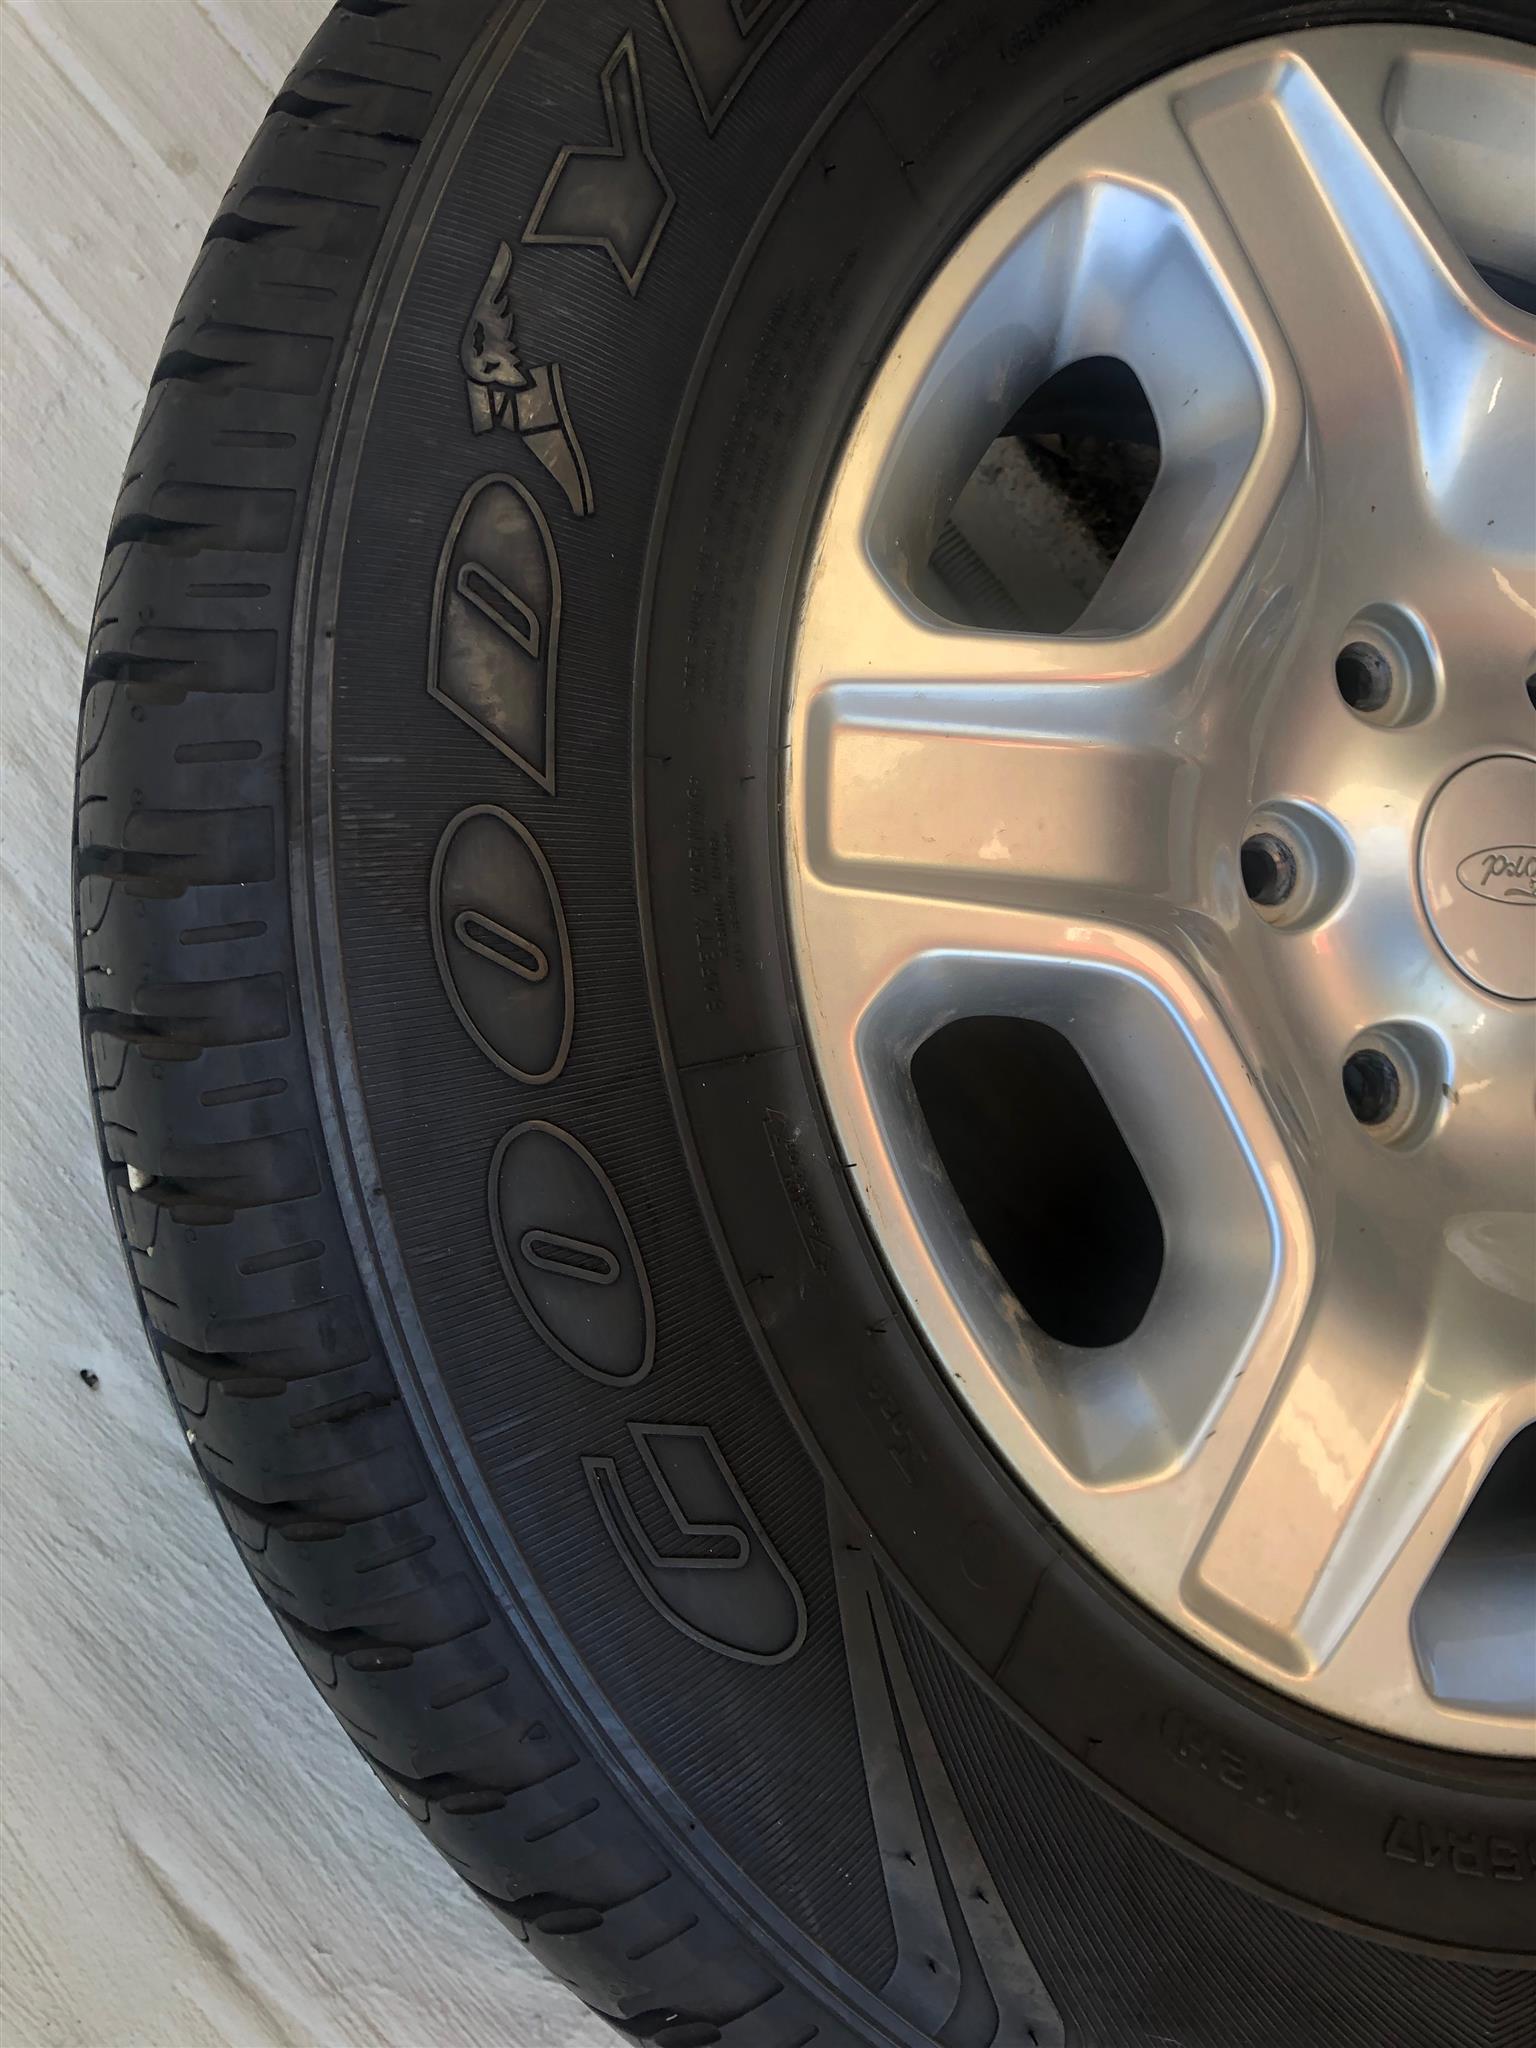 Wheels X 4, Good Year Wrangler